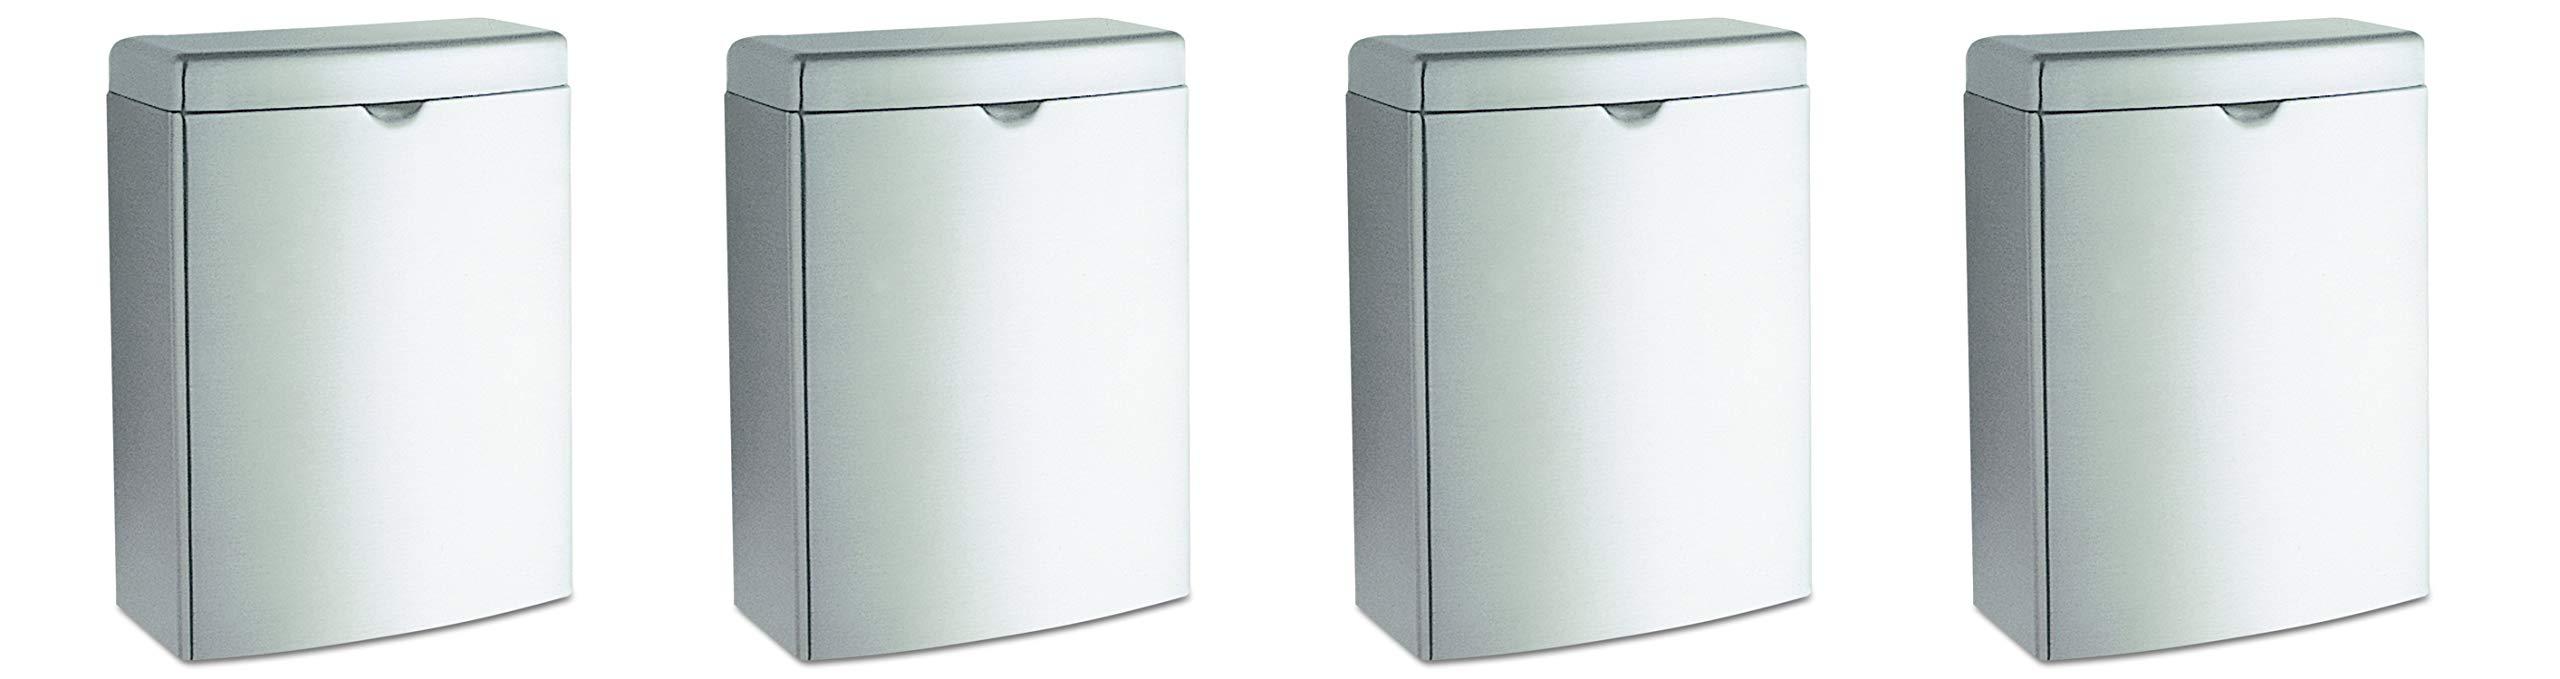 Bobrick 270 Contura Sanitary Napkin Receptacle, Rectangular, Stainless Steel, 1gal (Pack of 4) by Bobrick